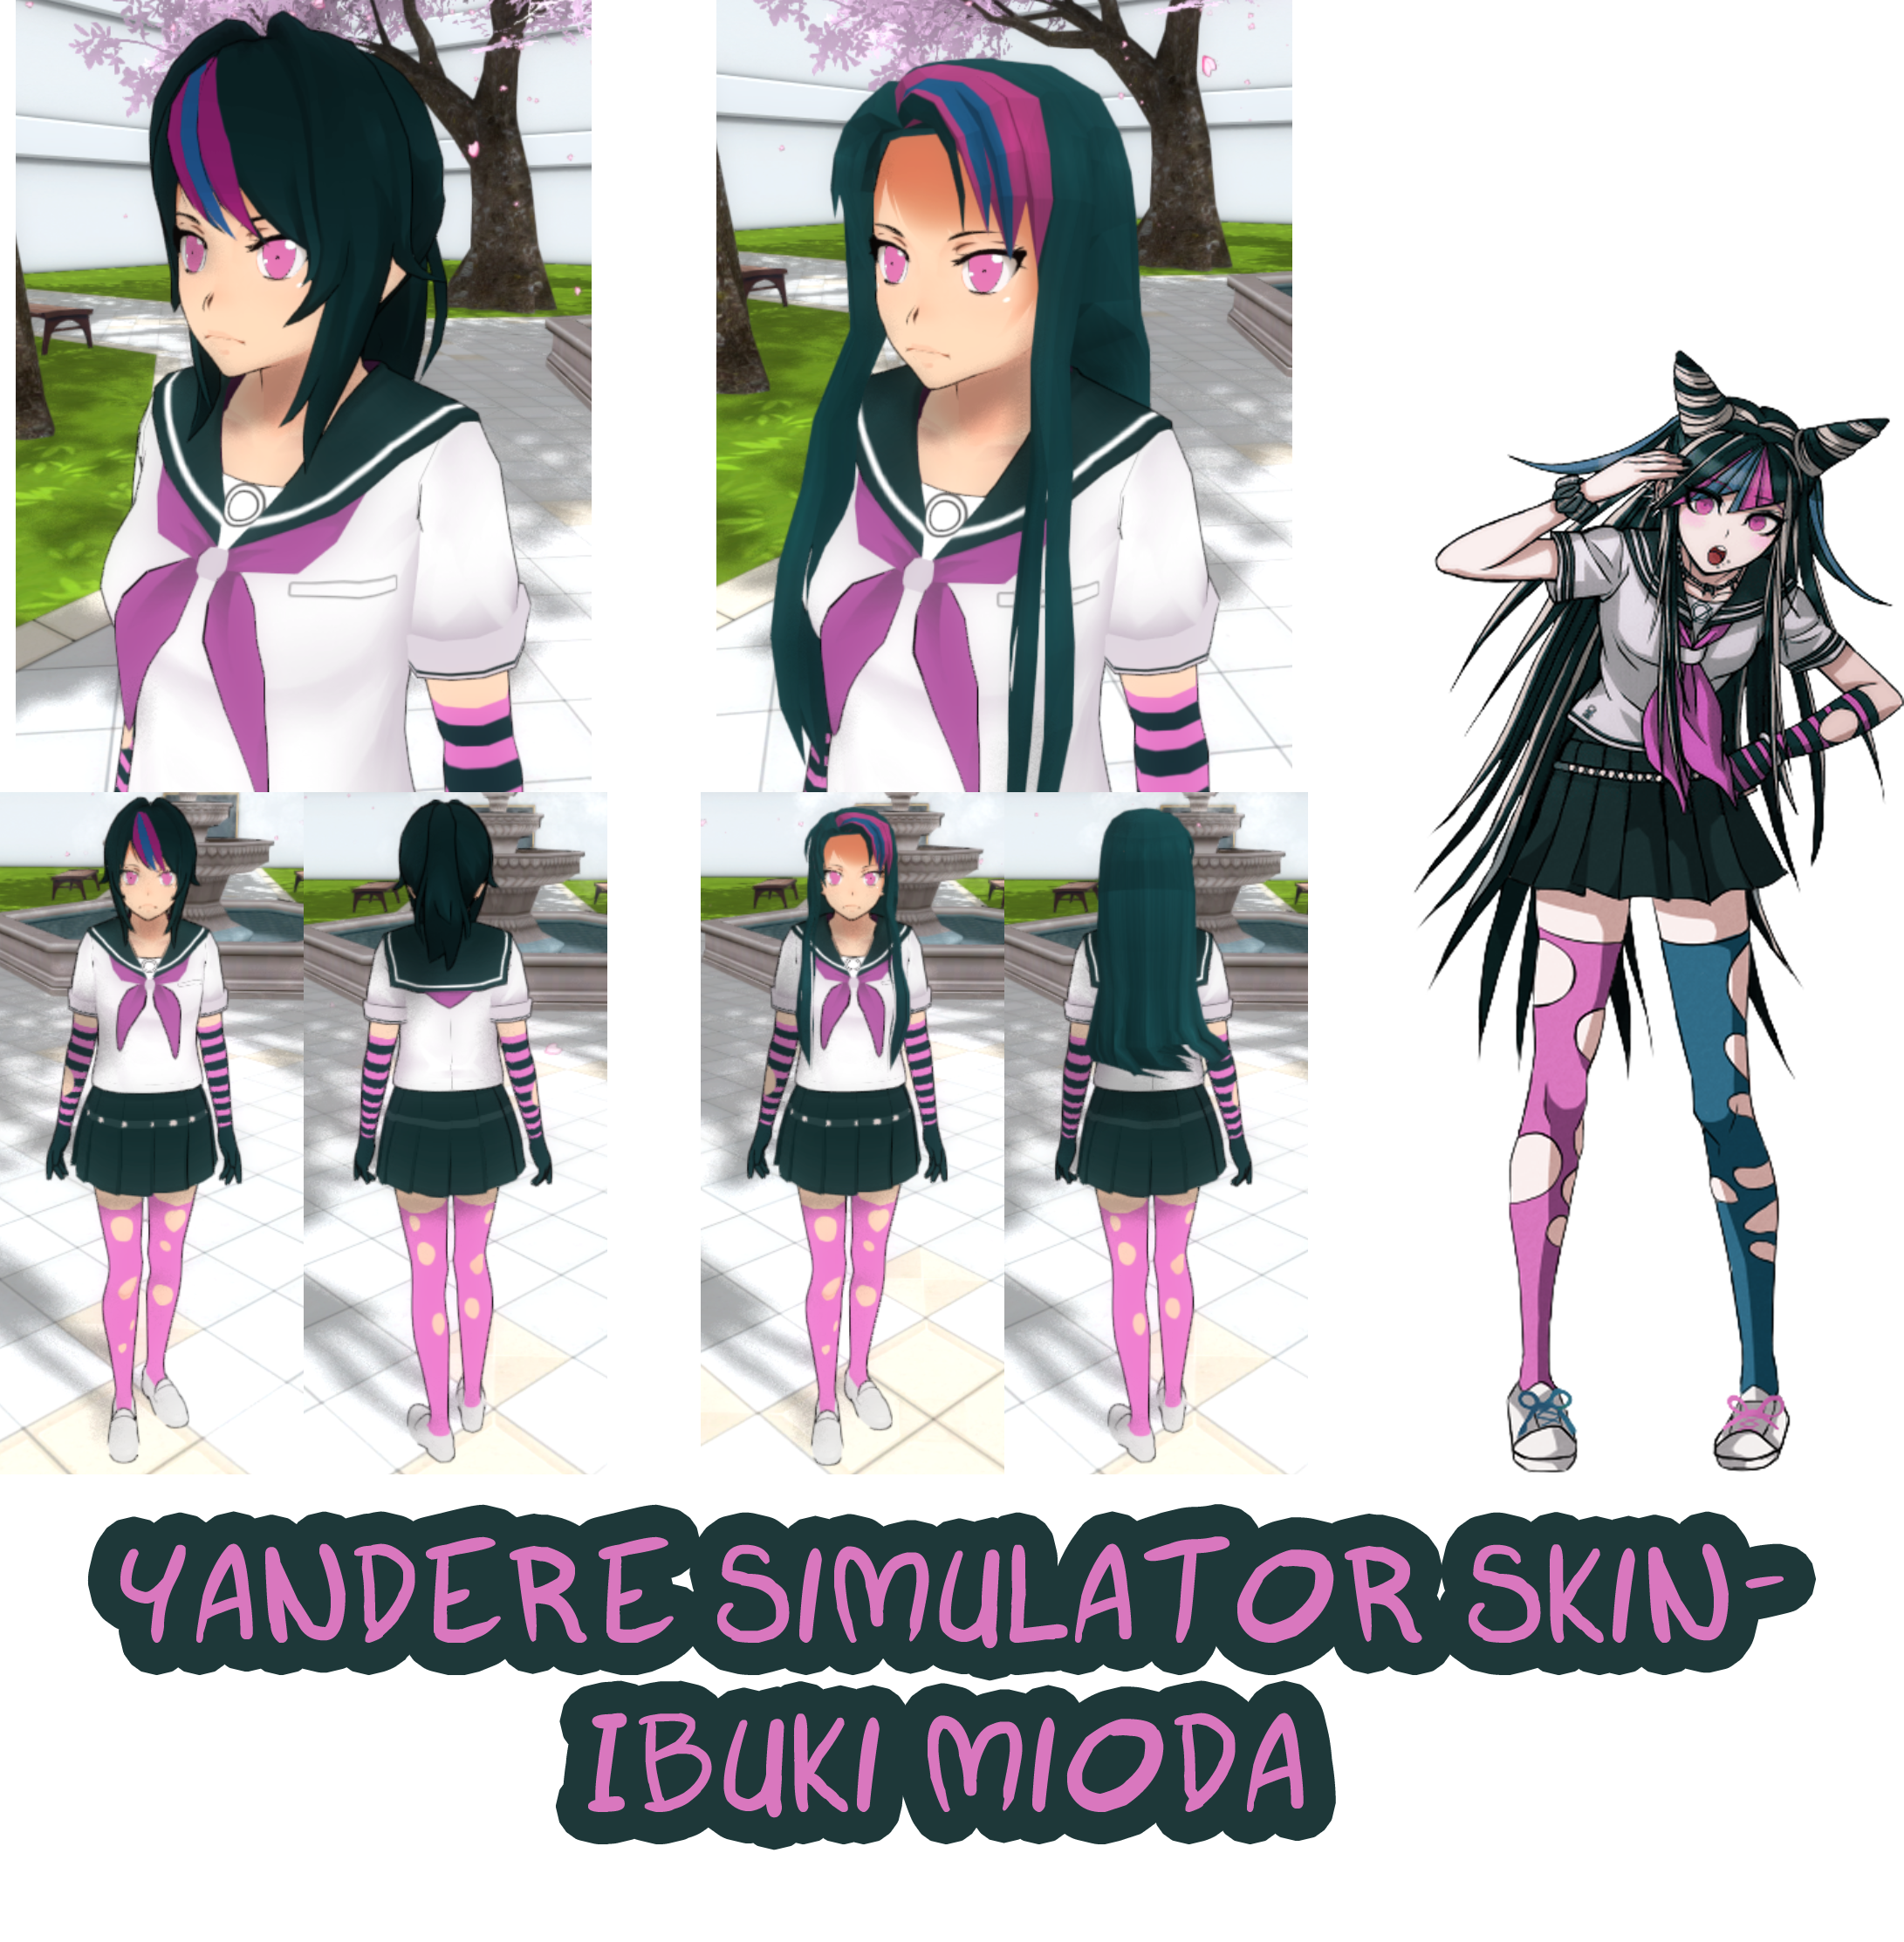 Yandere Simulator- Ibuki Mioda Skin by ImaginaryAlchemist on